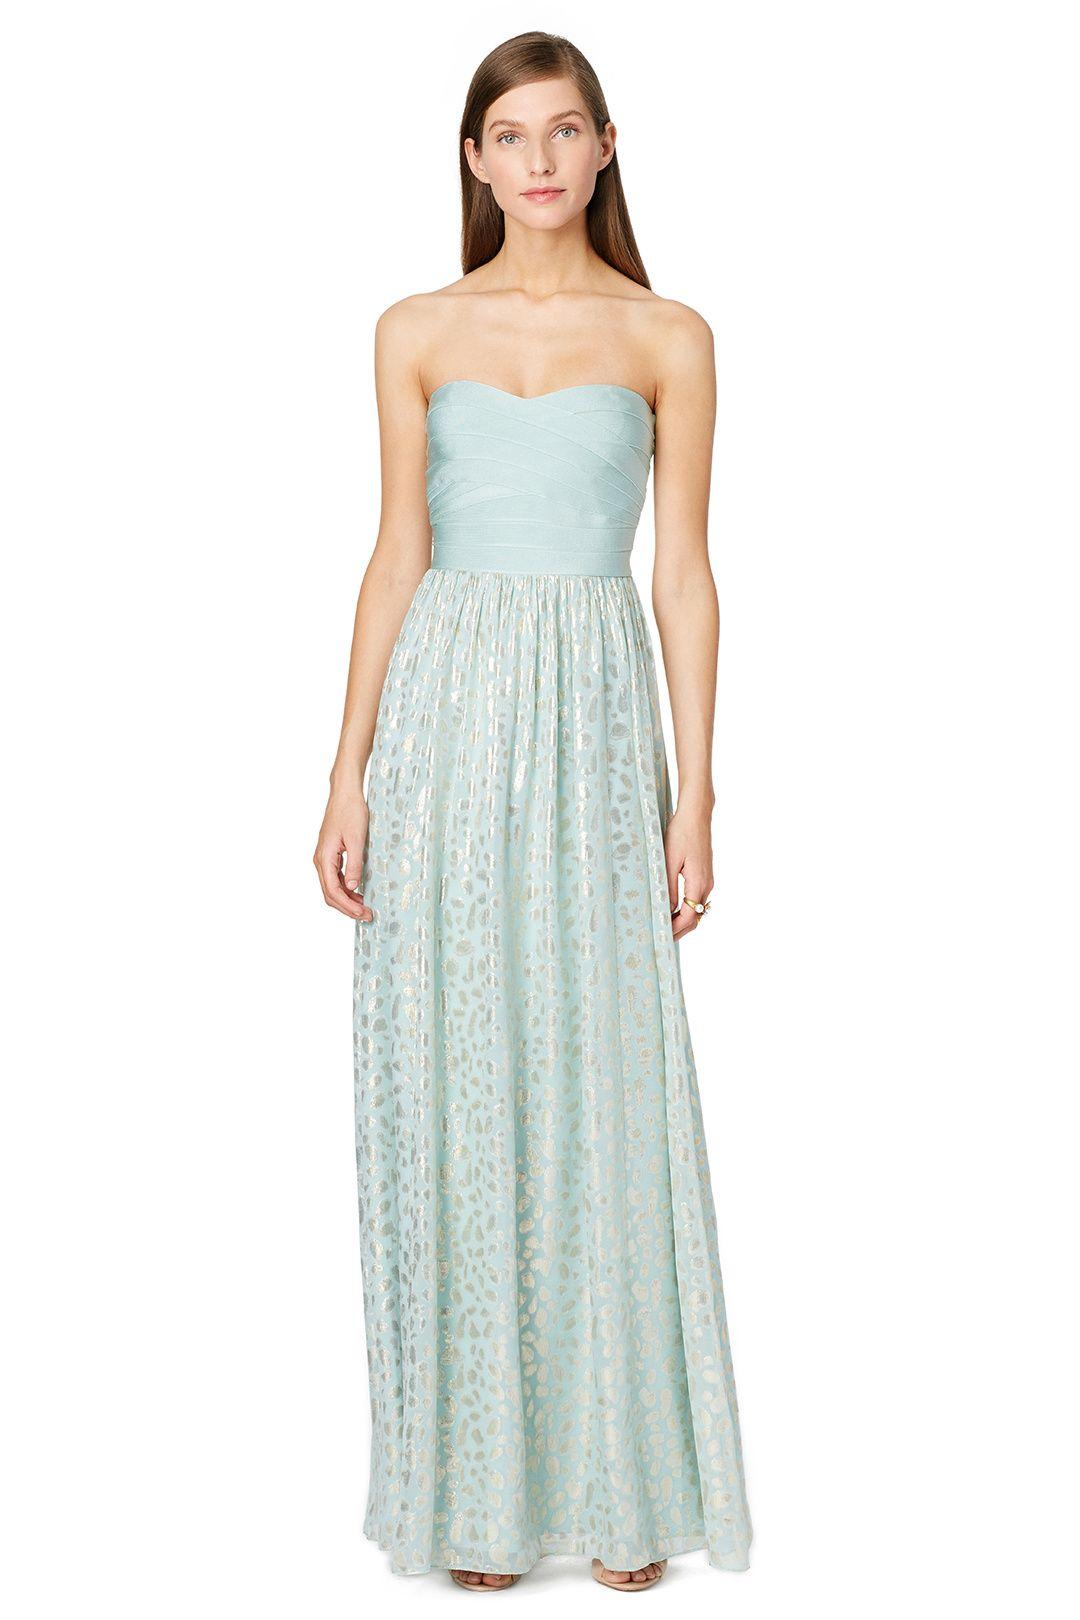 Mint mosaic maxi dress maxi dresses mint bridesmaid dresses and mint mosaic maxi dress ombrellifo Gallery